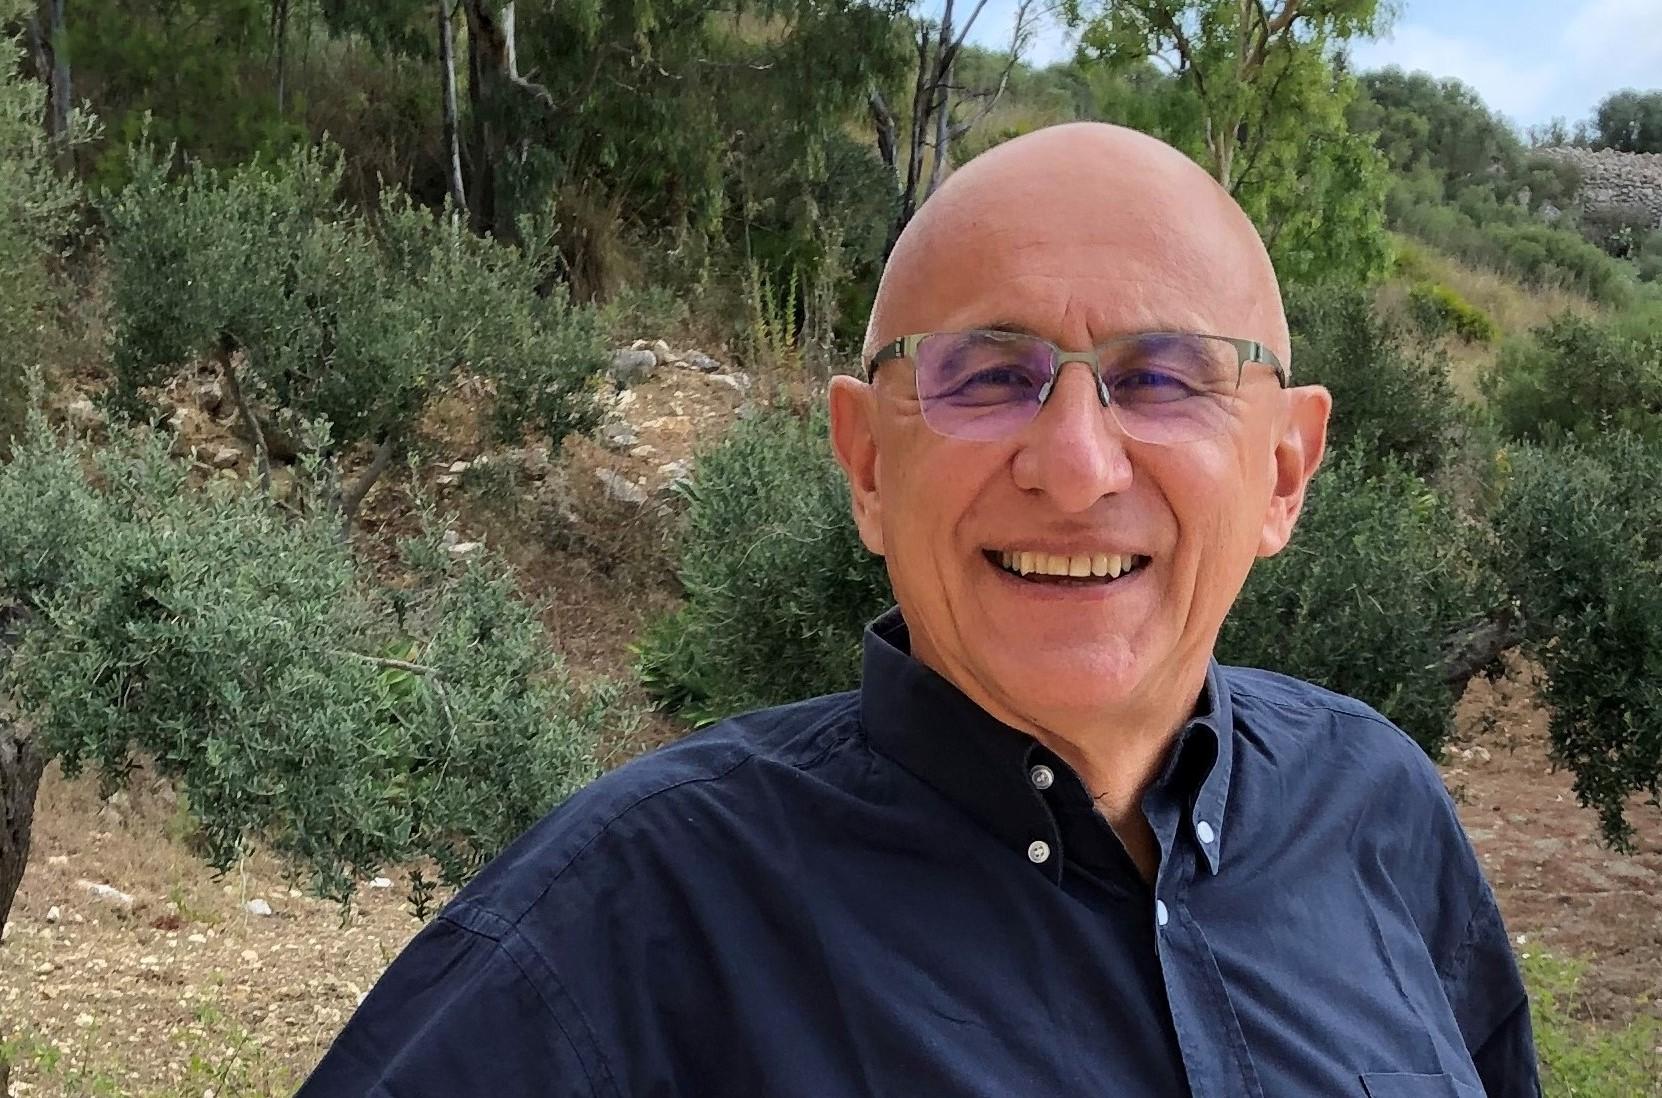 Stefano Zatti